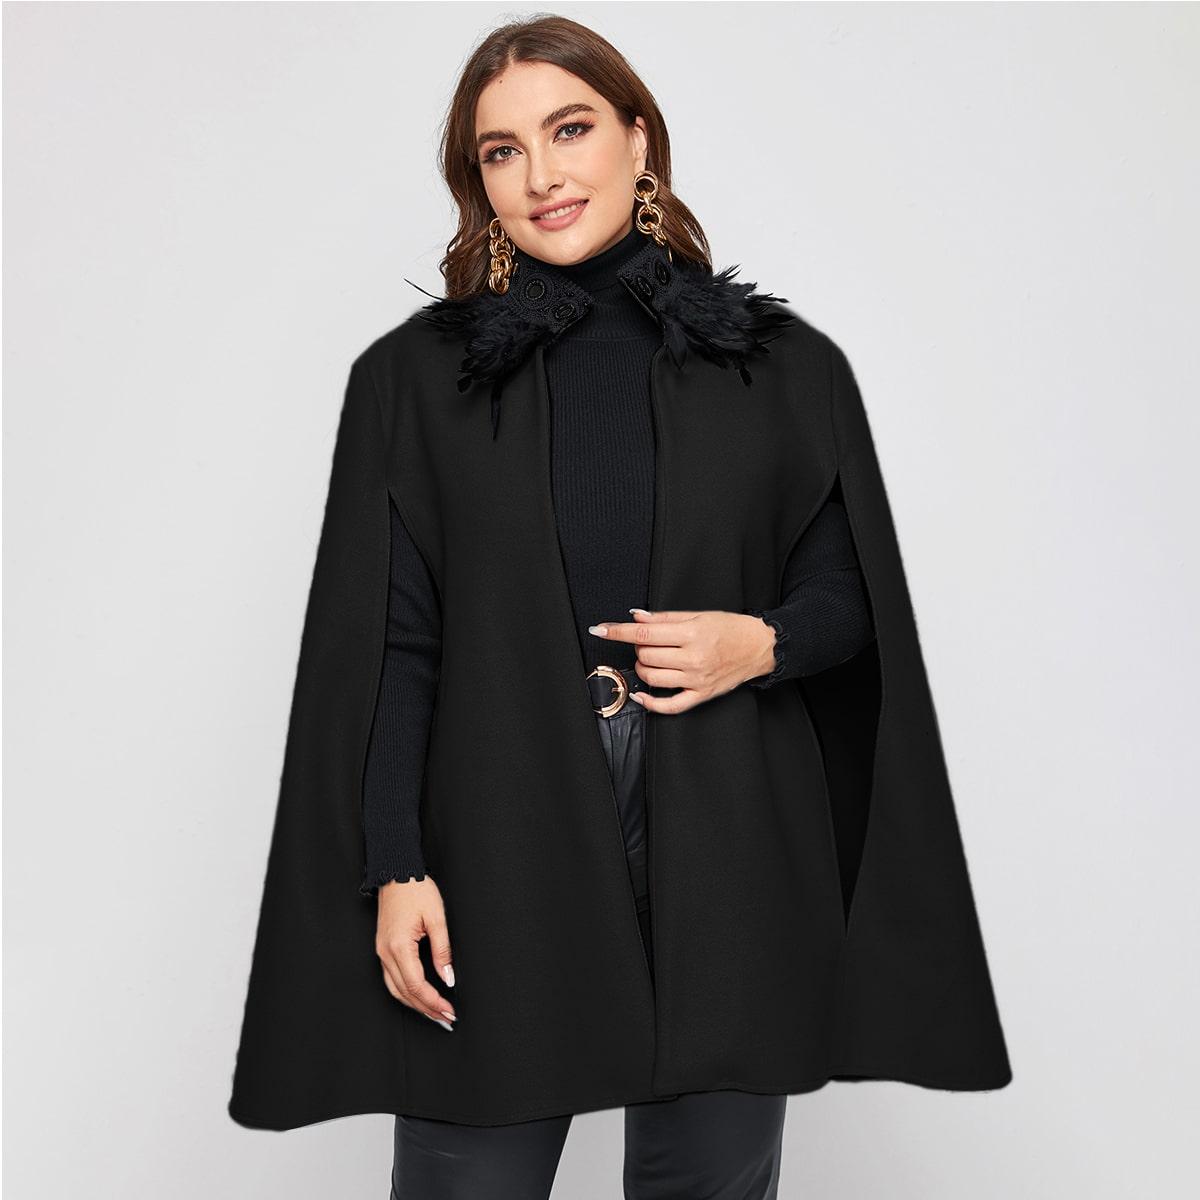 Контрастные кружева Одноцветный Элегантный Плюс размеры пальто